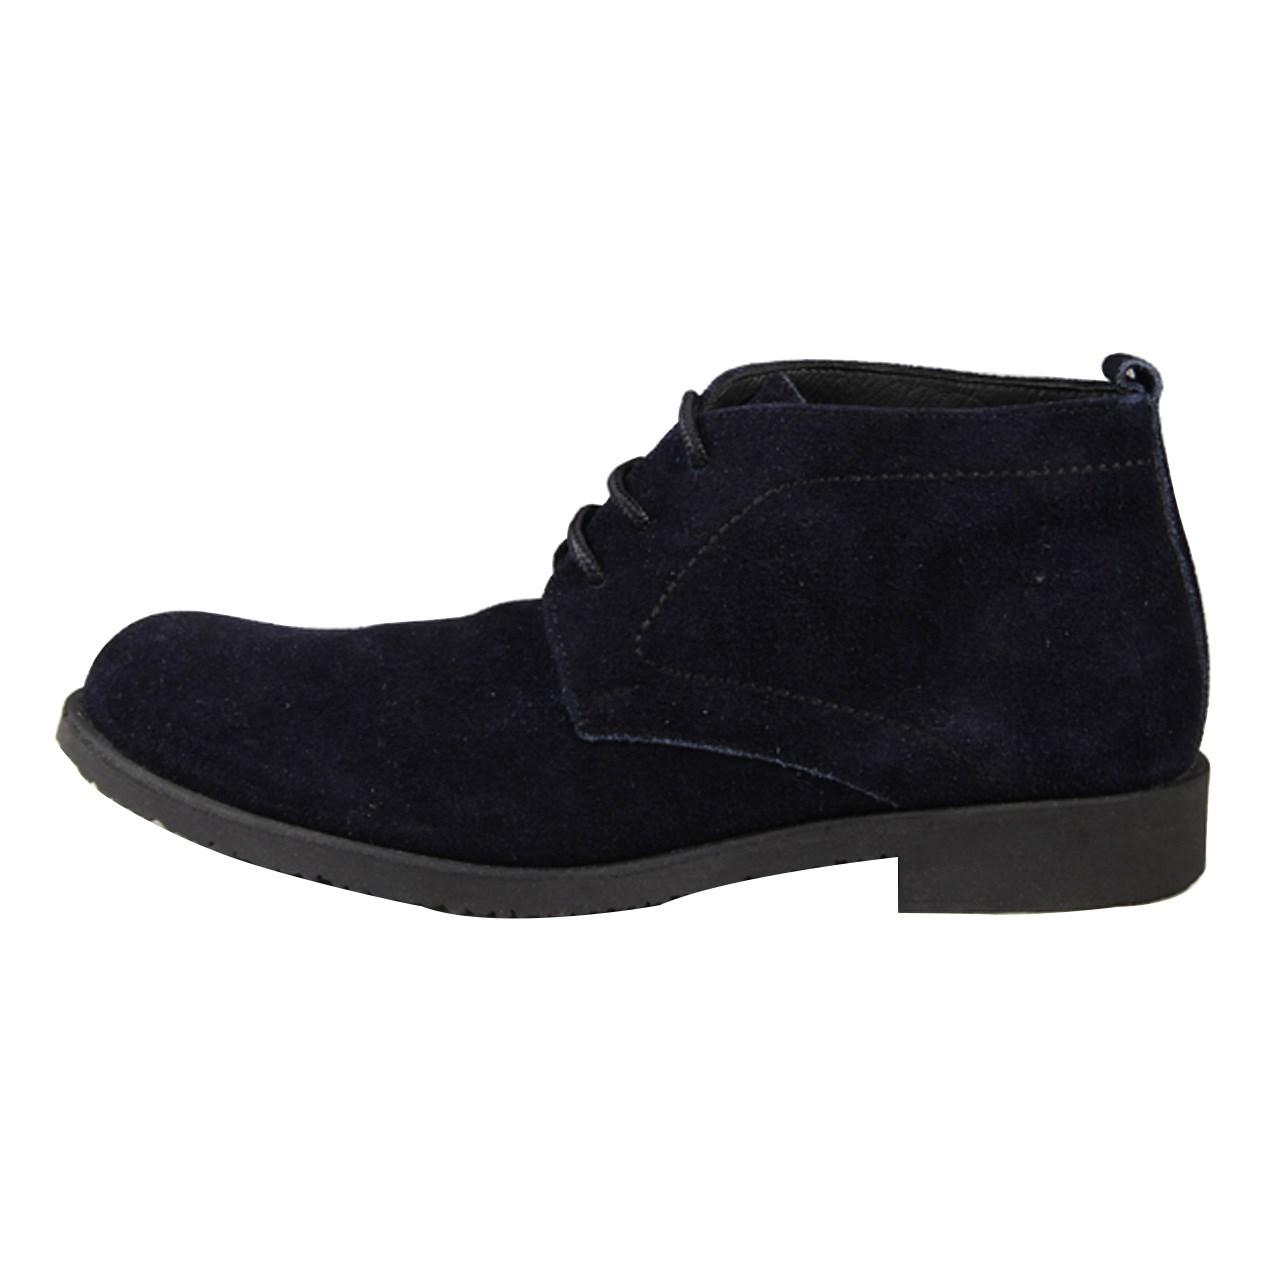 کفش مردانه شهر چرم مدل 13-39189